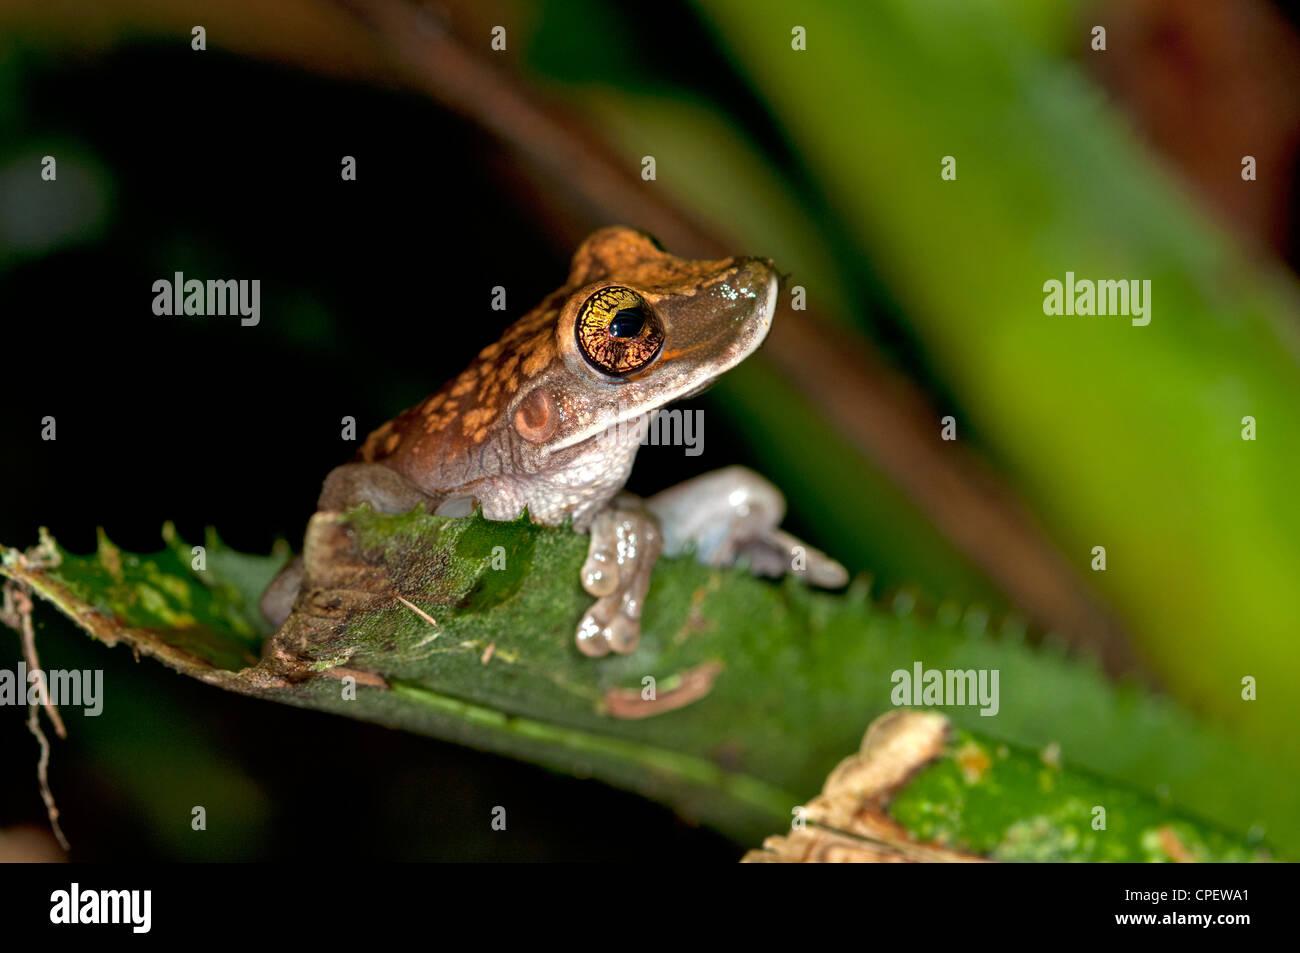 Osteocephalus sp., a Bony-headed Treefrog, Tiputini rain forest, Yasuni National Park, Ecuador - Stock Image